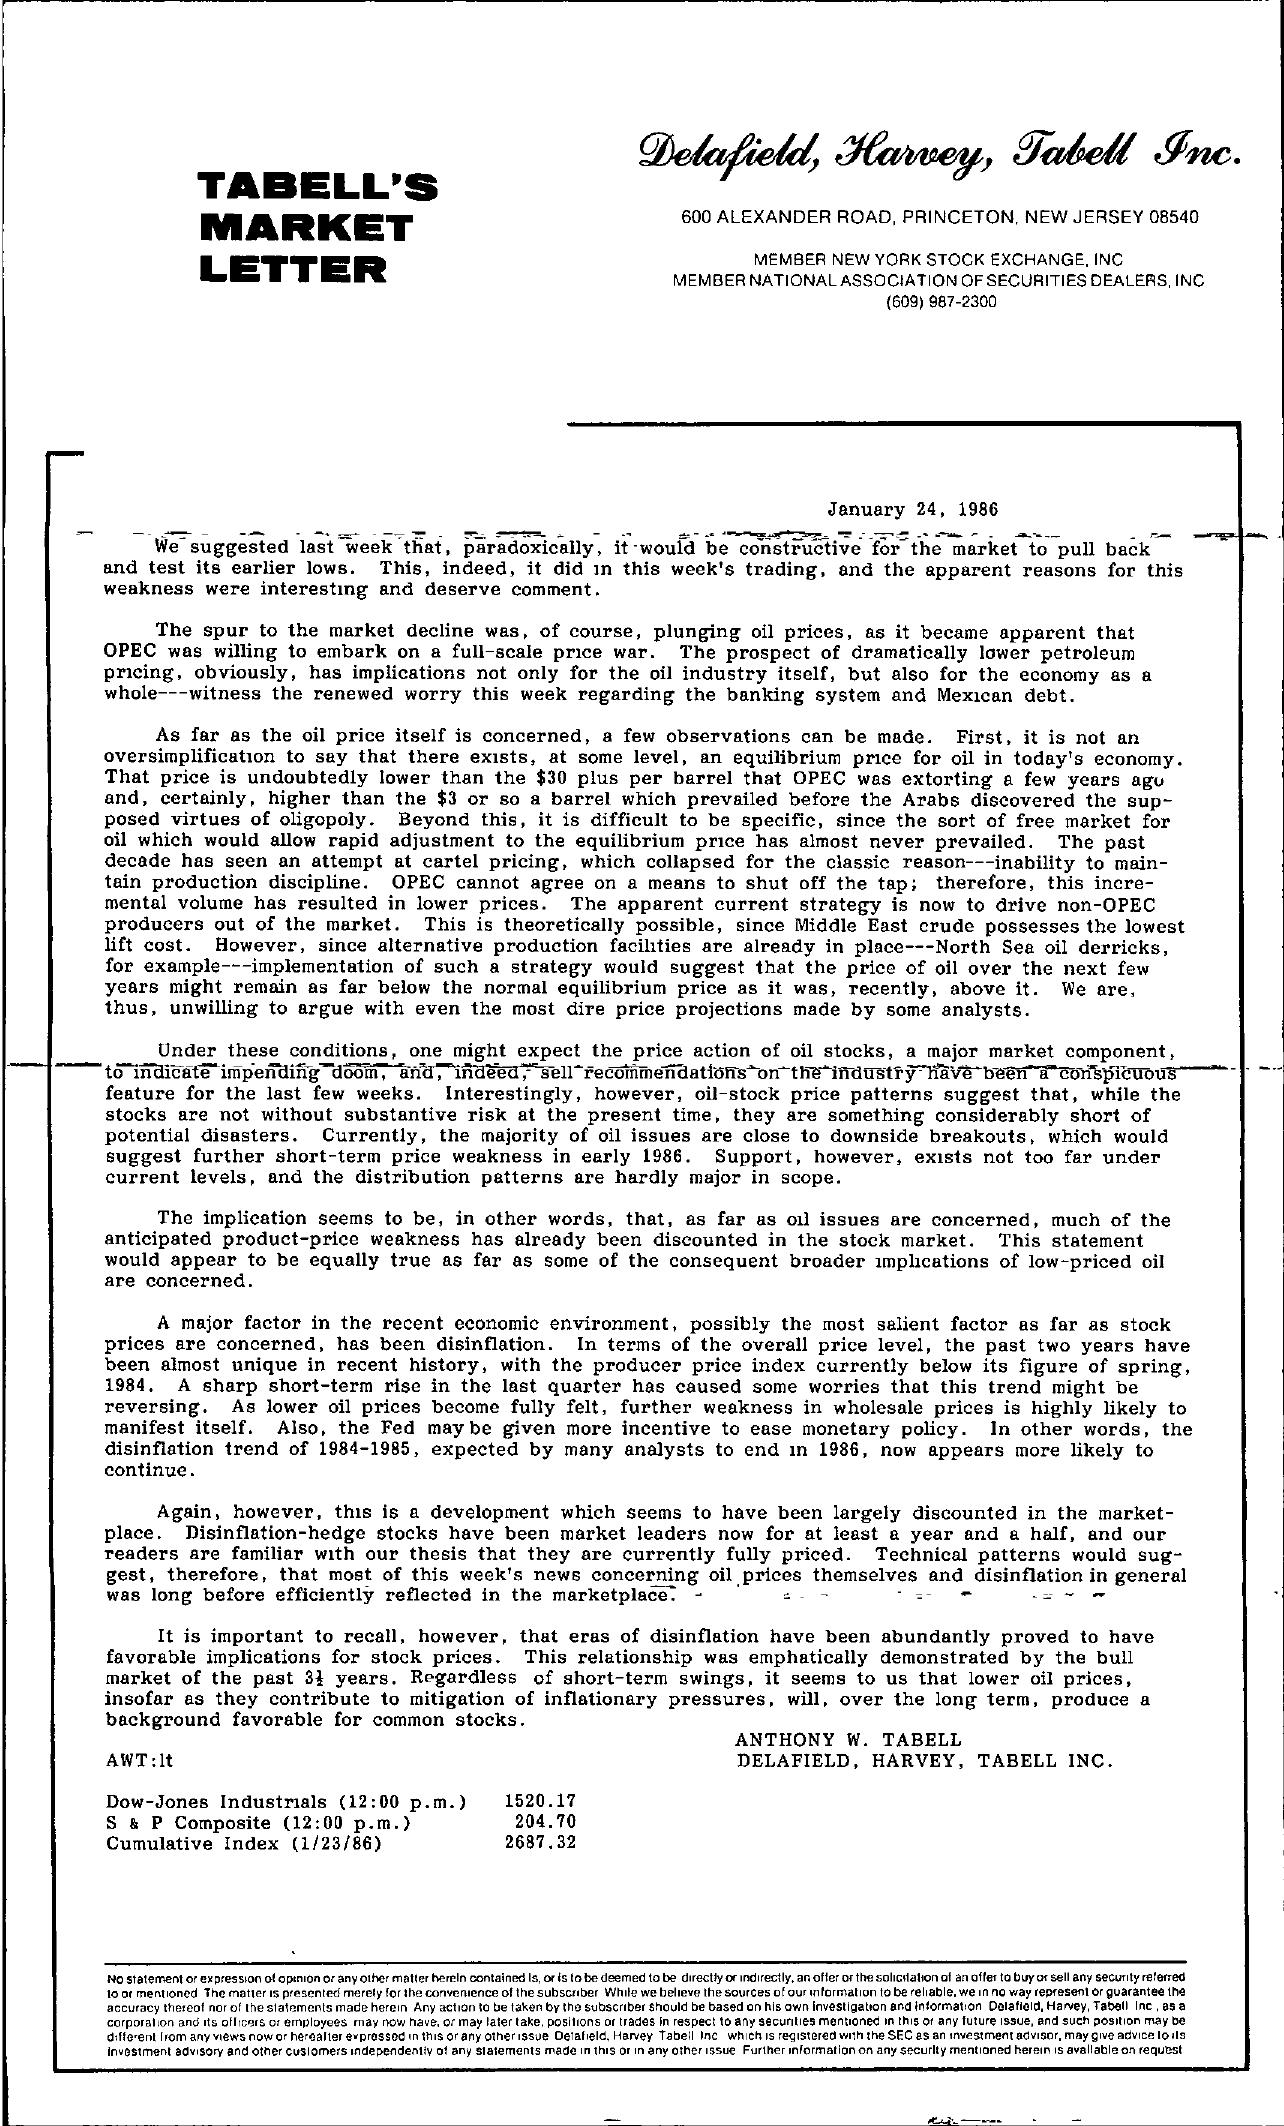 Tabell's Market Letter - January 24, 1986